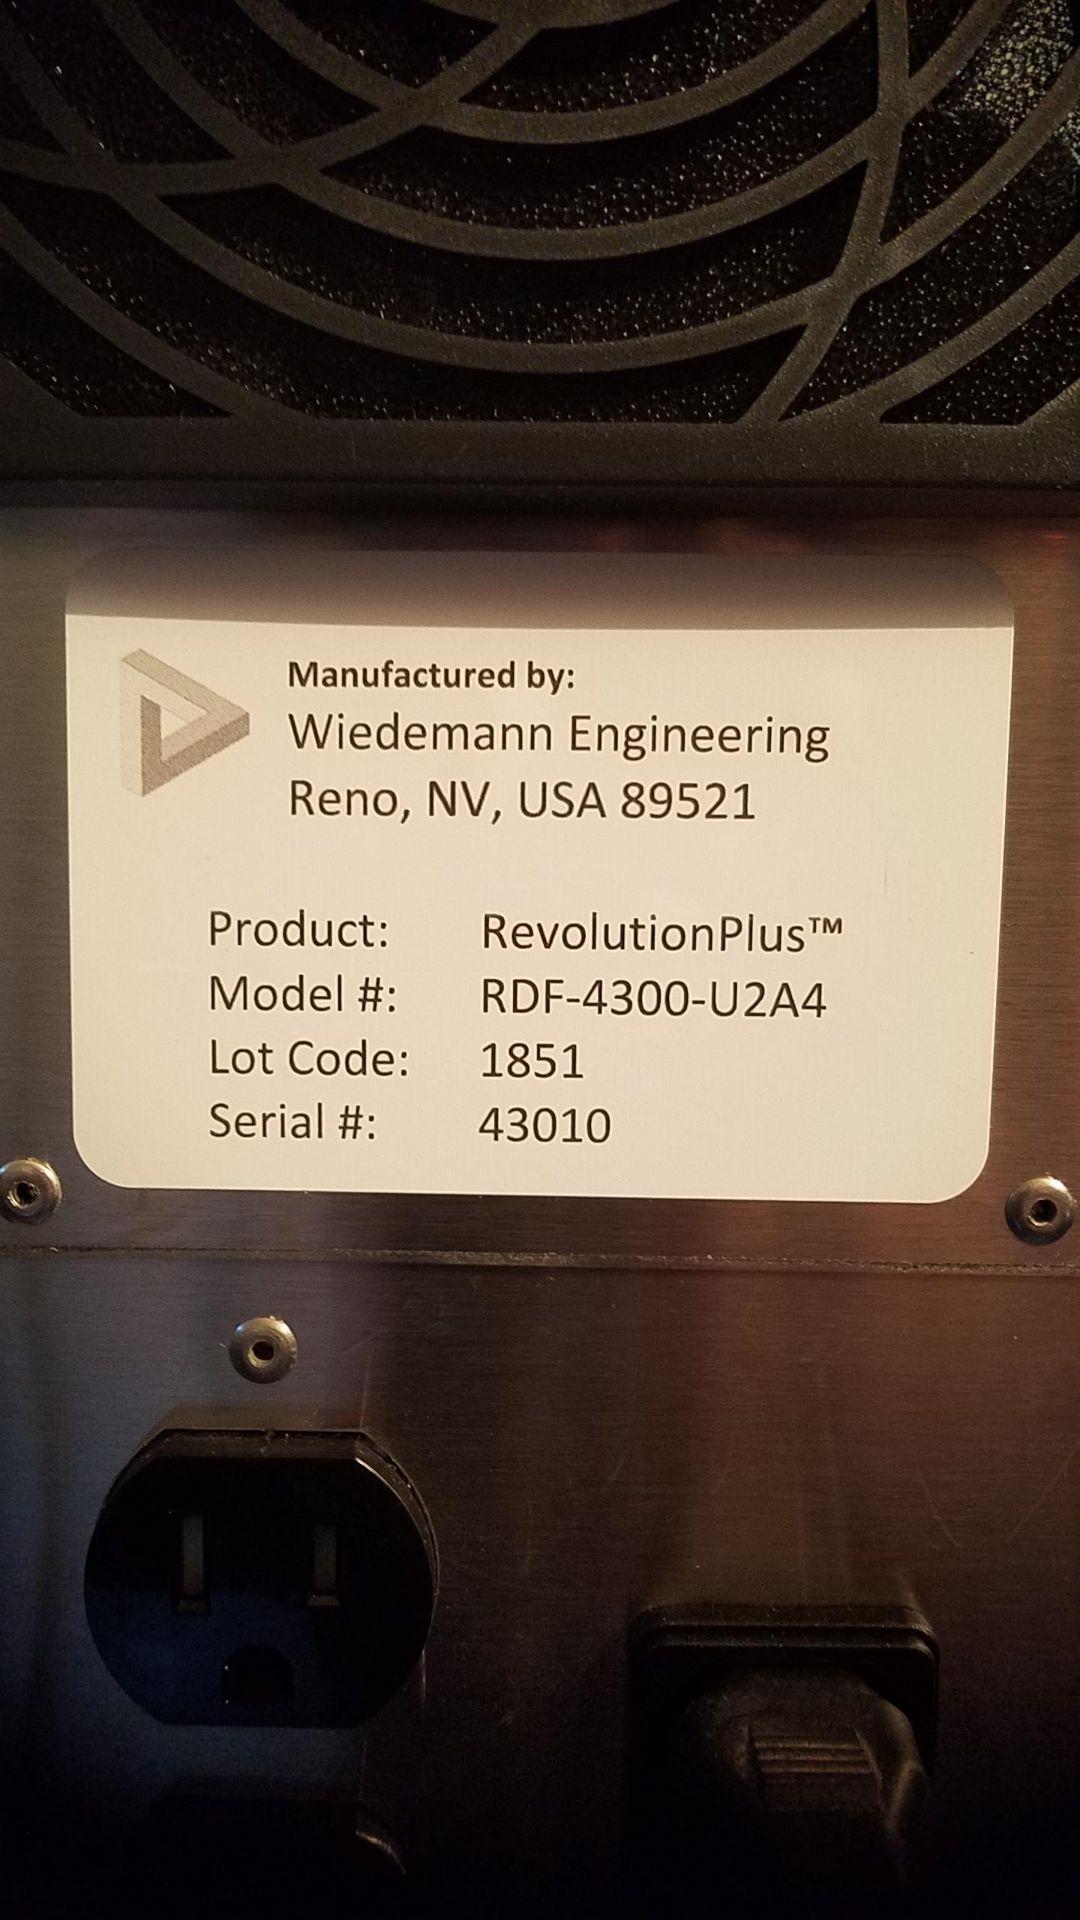 Unused/FactoryNew Revolution Cannabis & Hemp Flower Finisher System Model RDF 4300. Make $1,500/day - Image 10 of 32